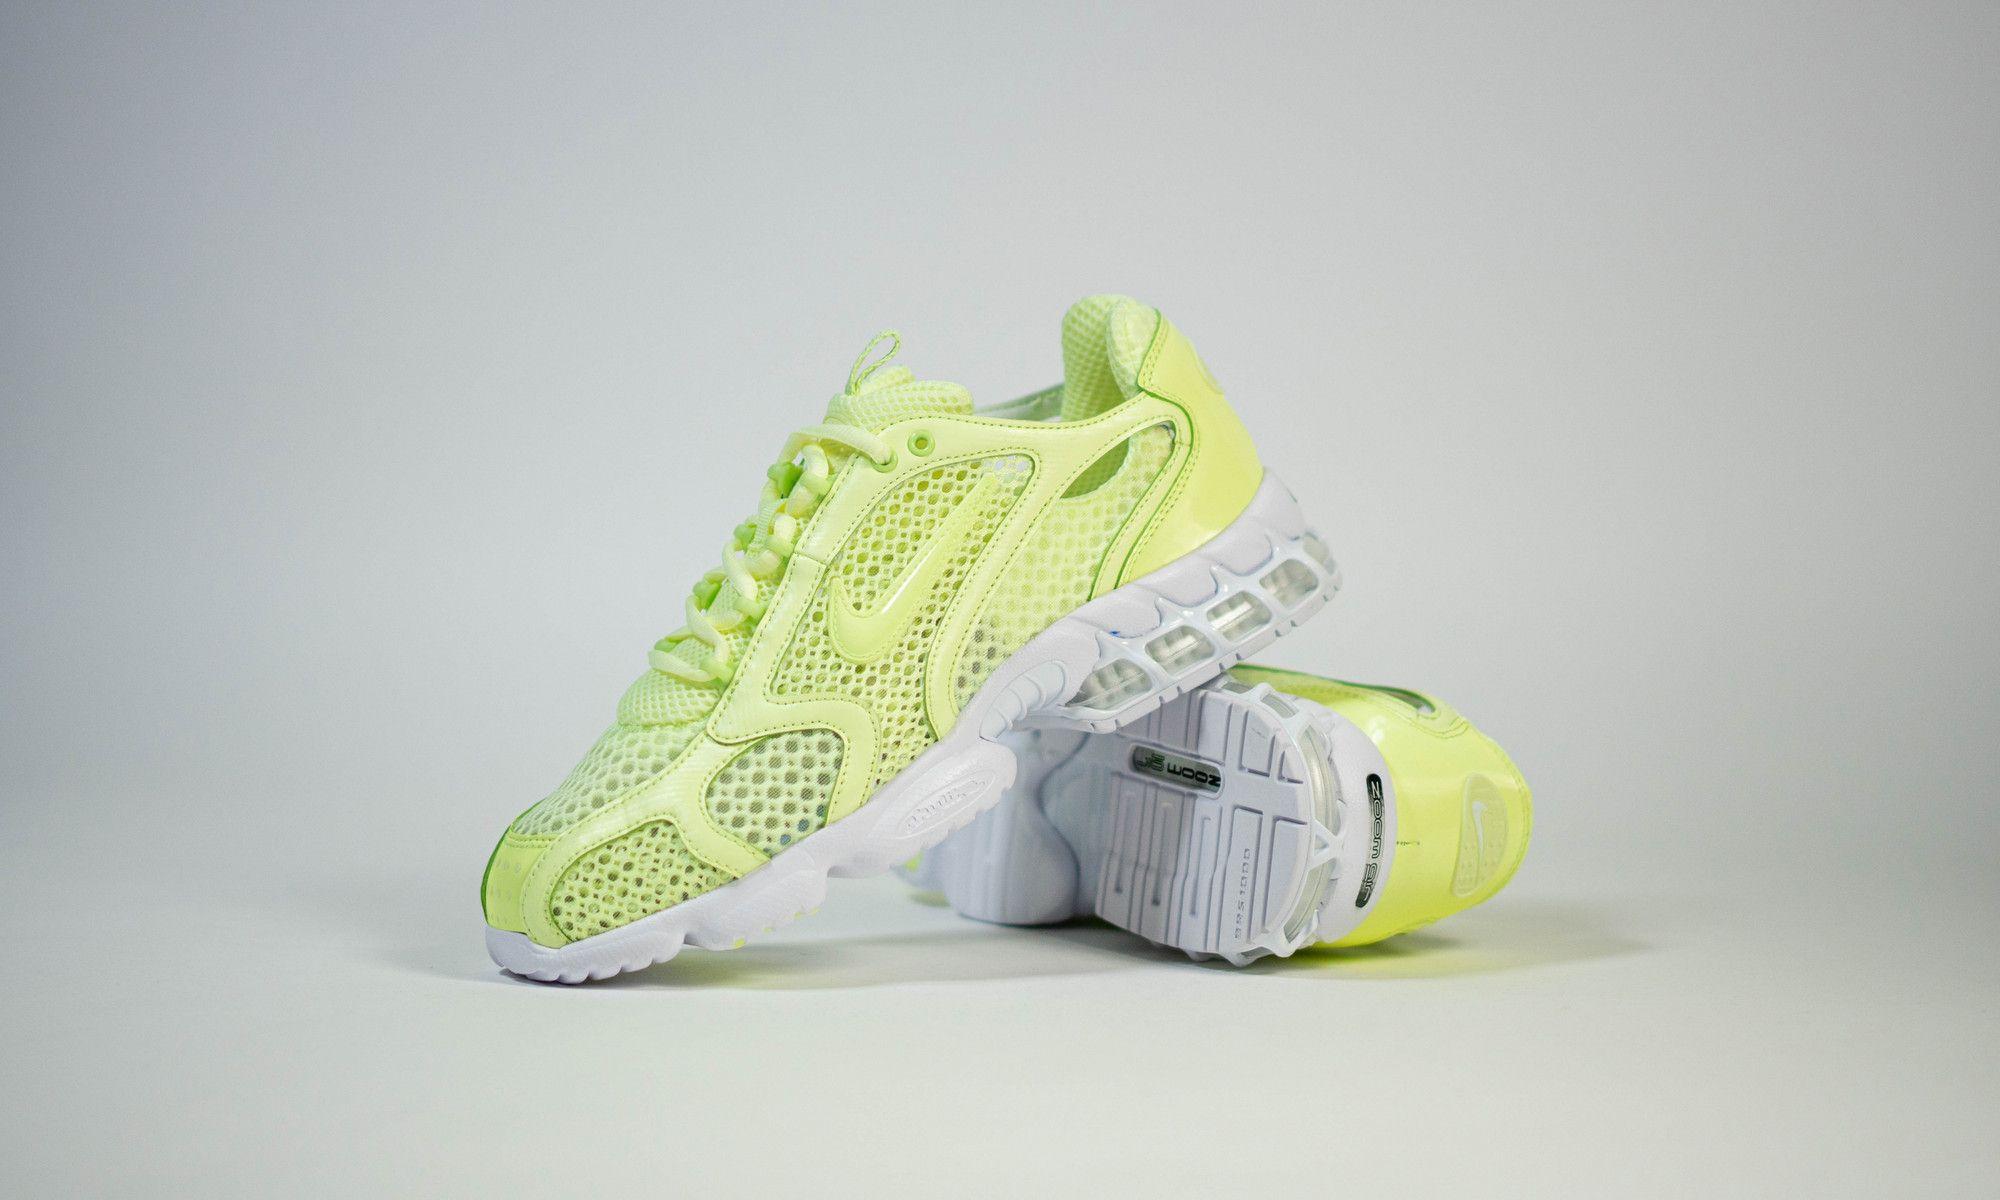 Nike Air Zoom Spiridon Cage 2 (Volt)